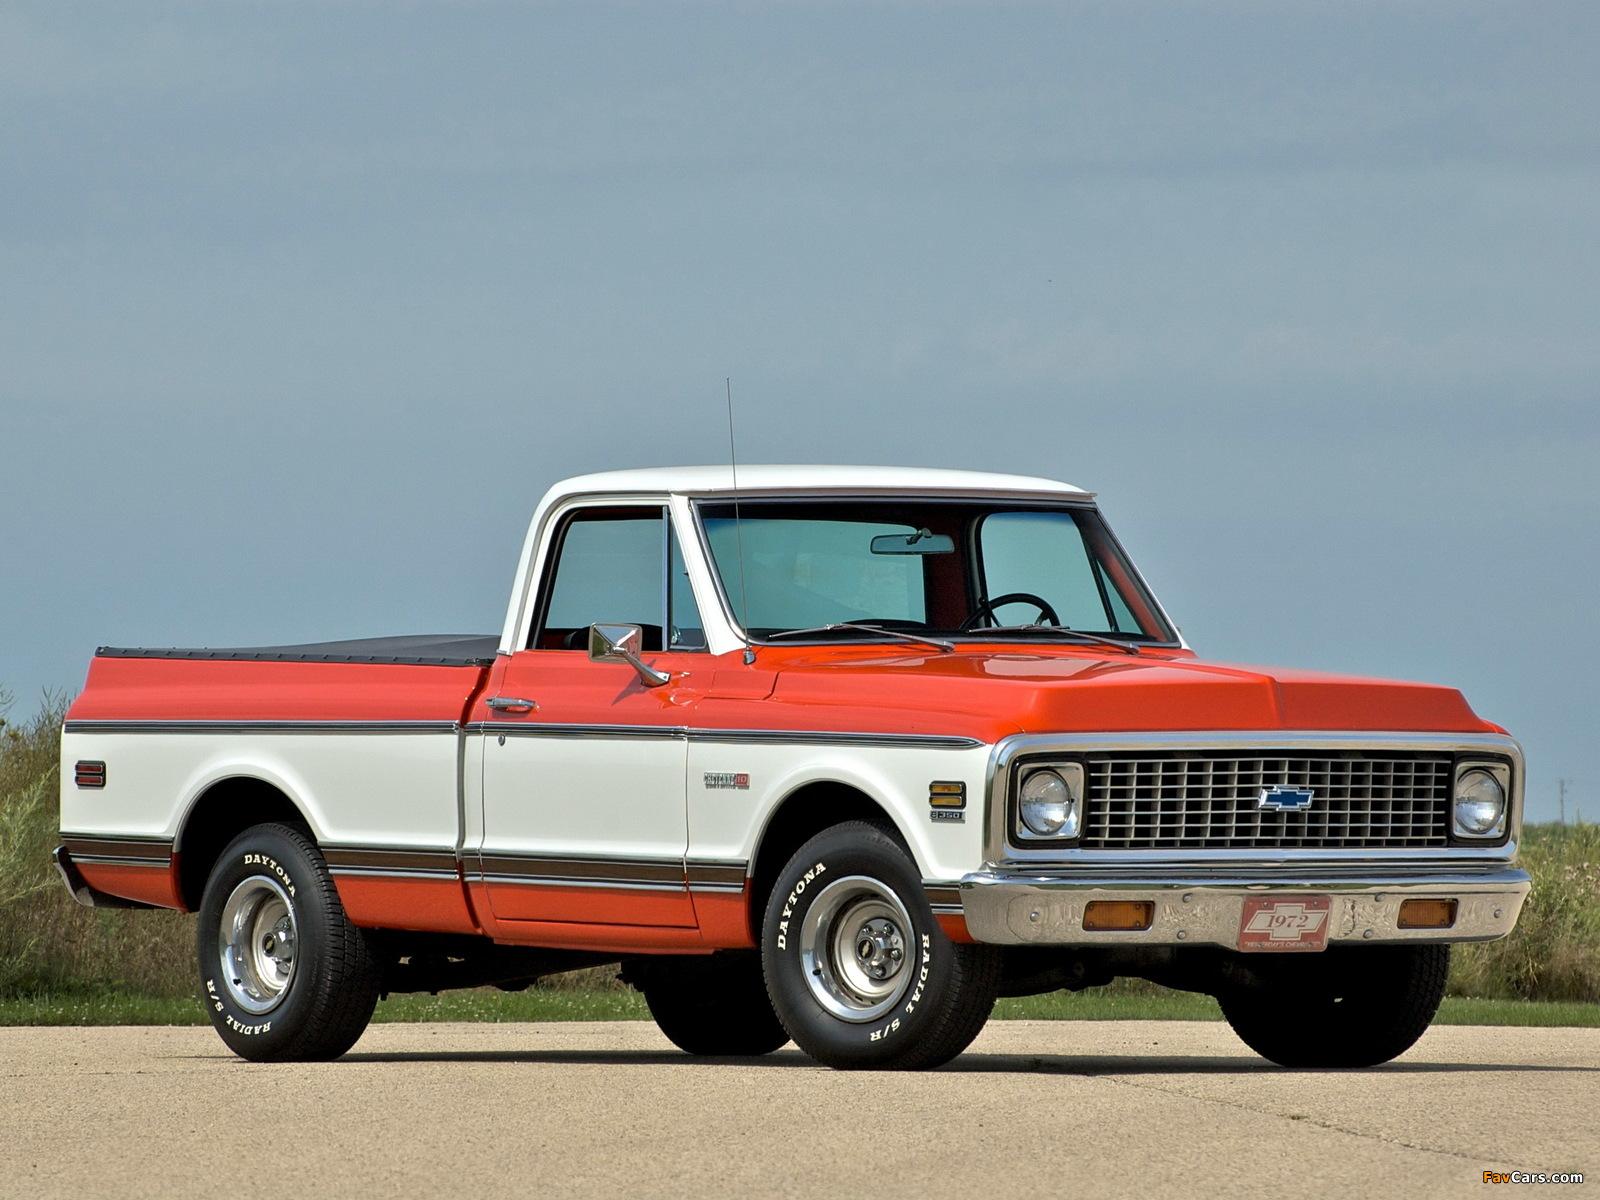 Chevrolet C10 Cheyenne Pickup 1971 72 Wallpapers 1600x1200